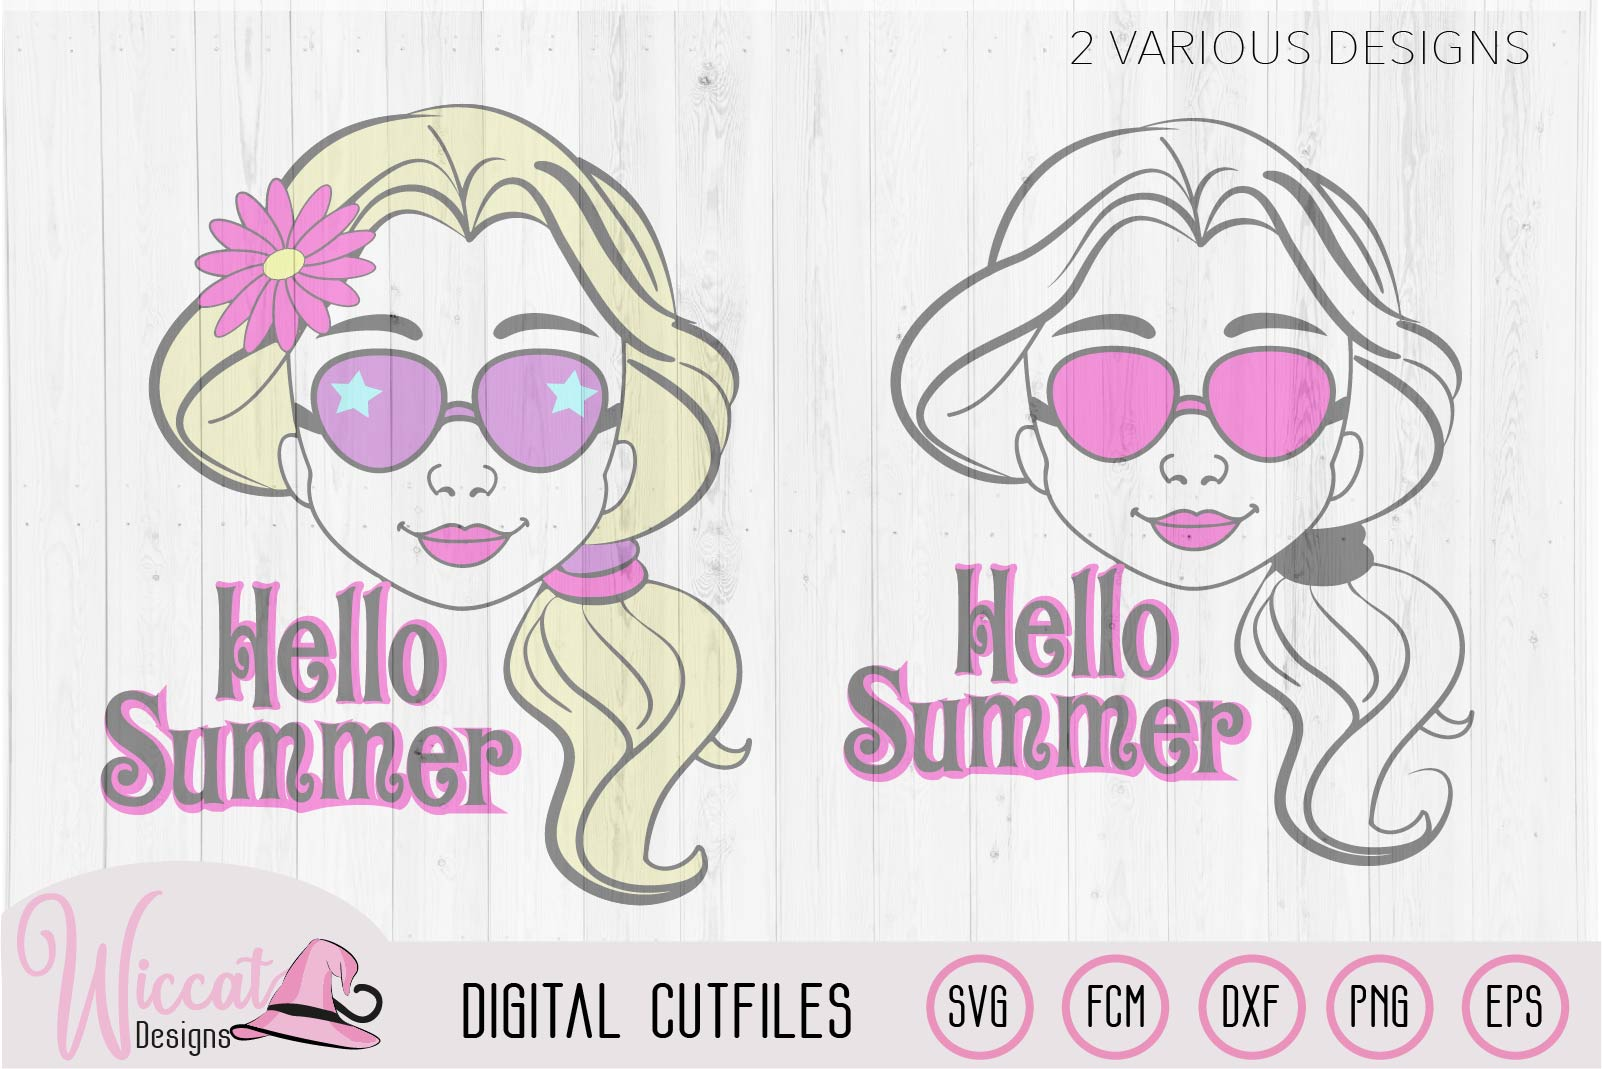 Summer girl, Cool girl, Hello summer, flower girl cut file example image 2